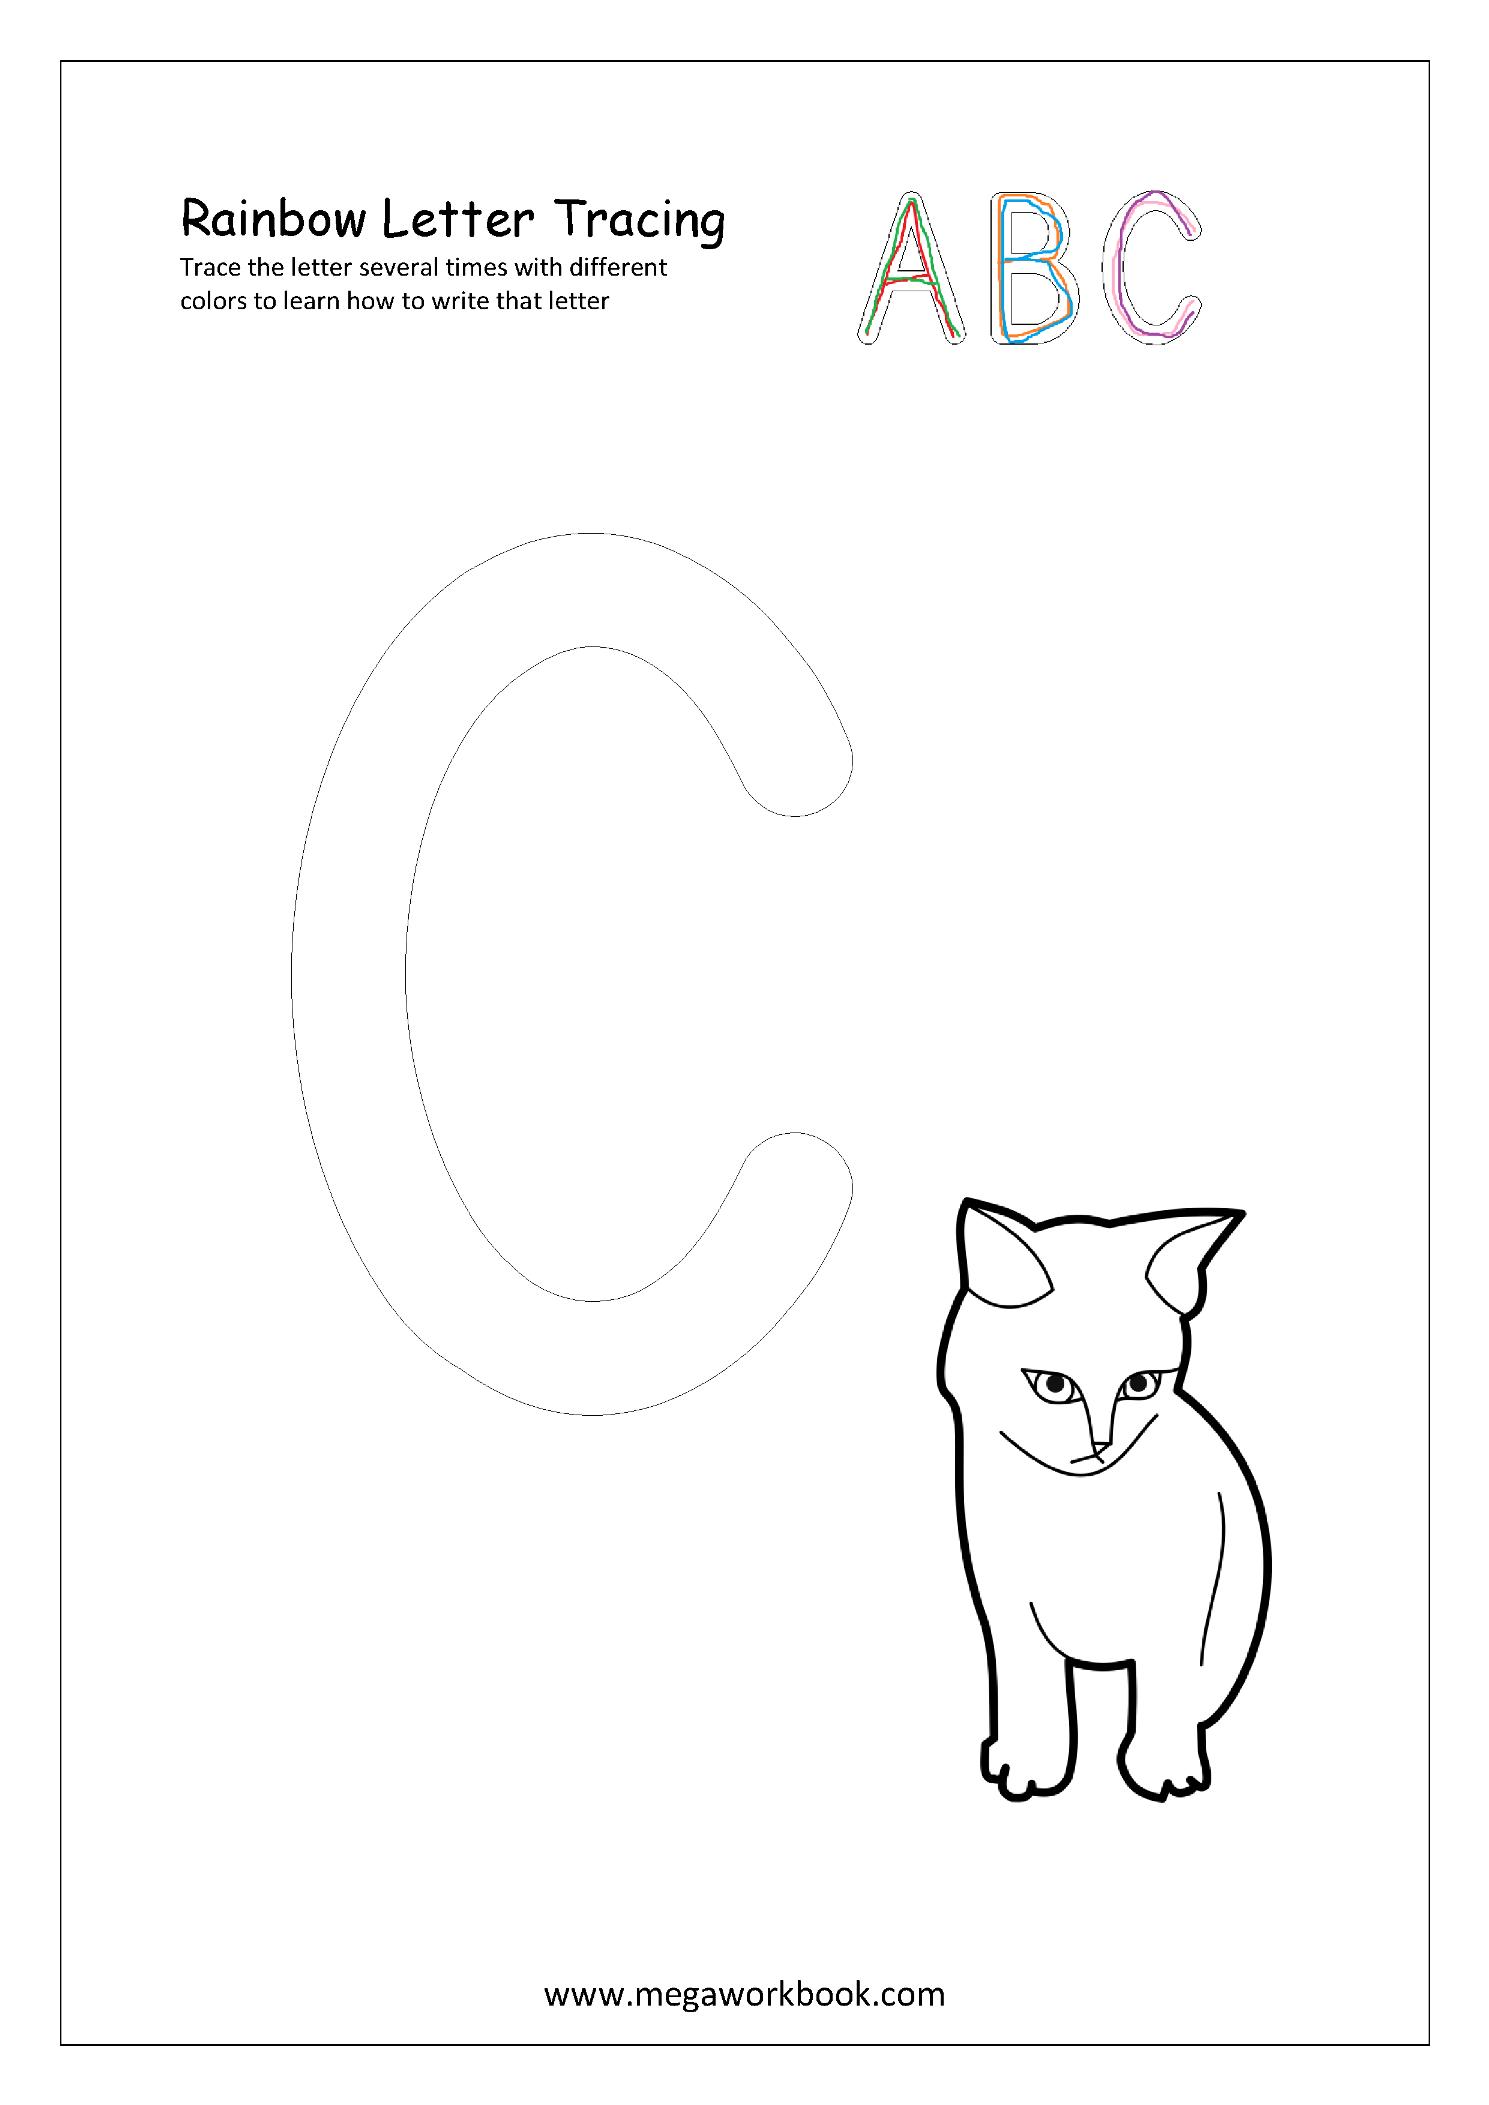 Free Printable Rainbow Writing Worksheets